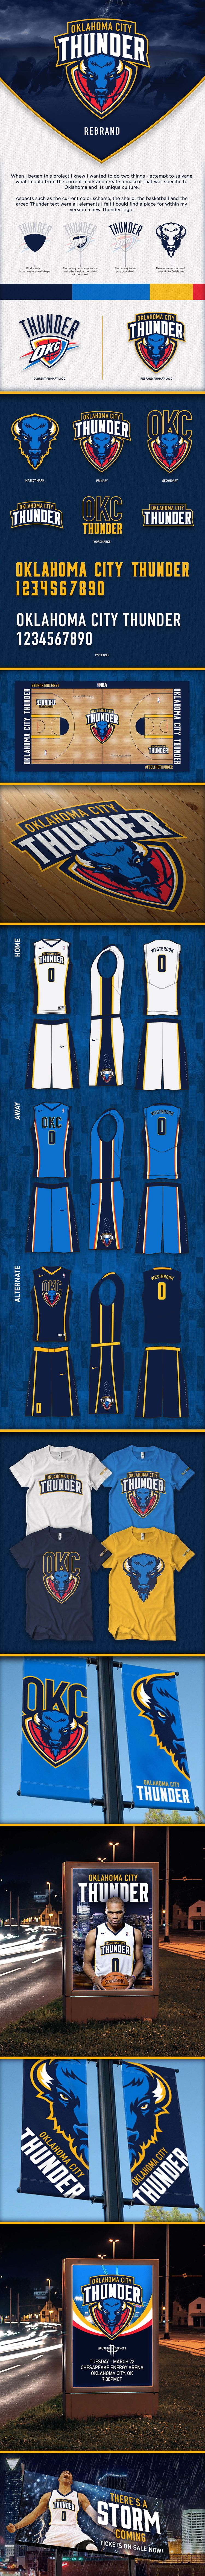 6140aed3a Oklahoma City Thunder Rebrand on Behance